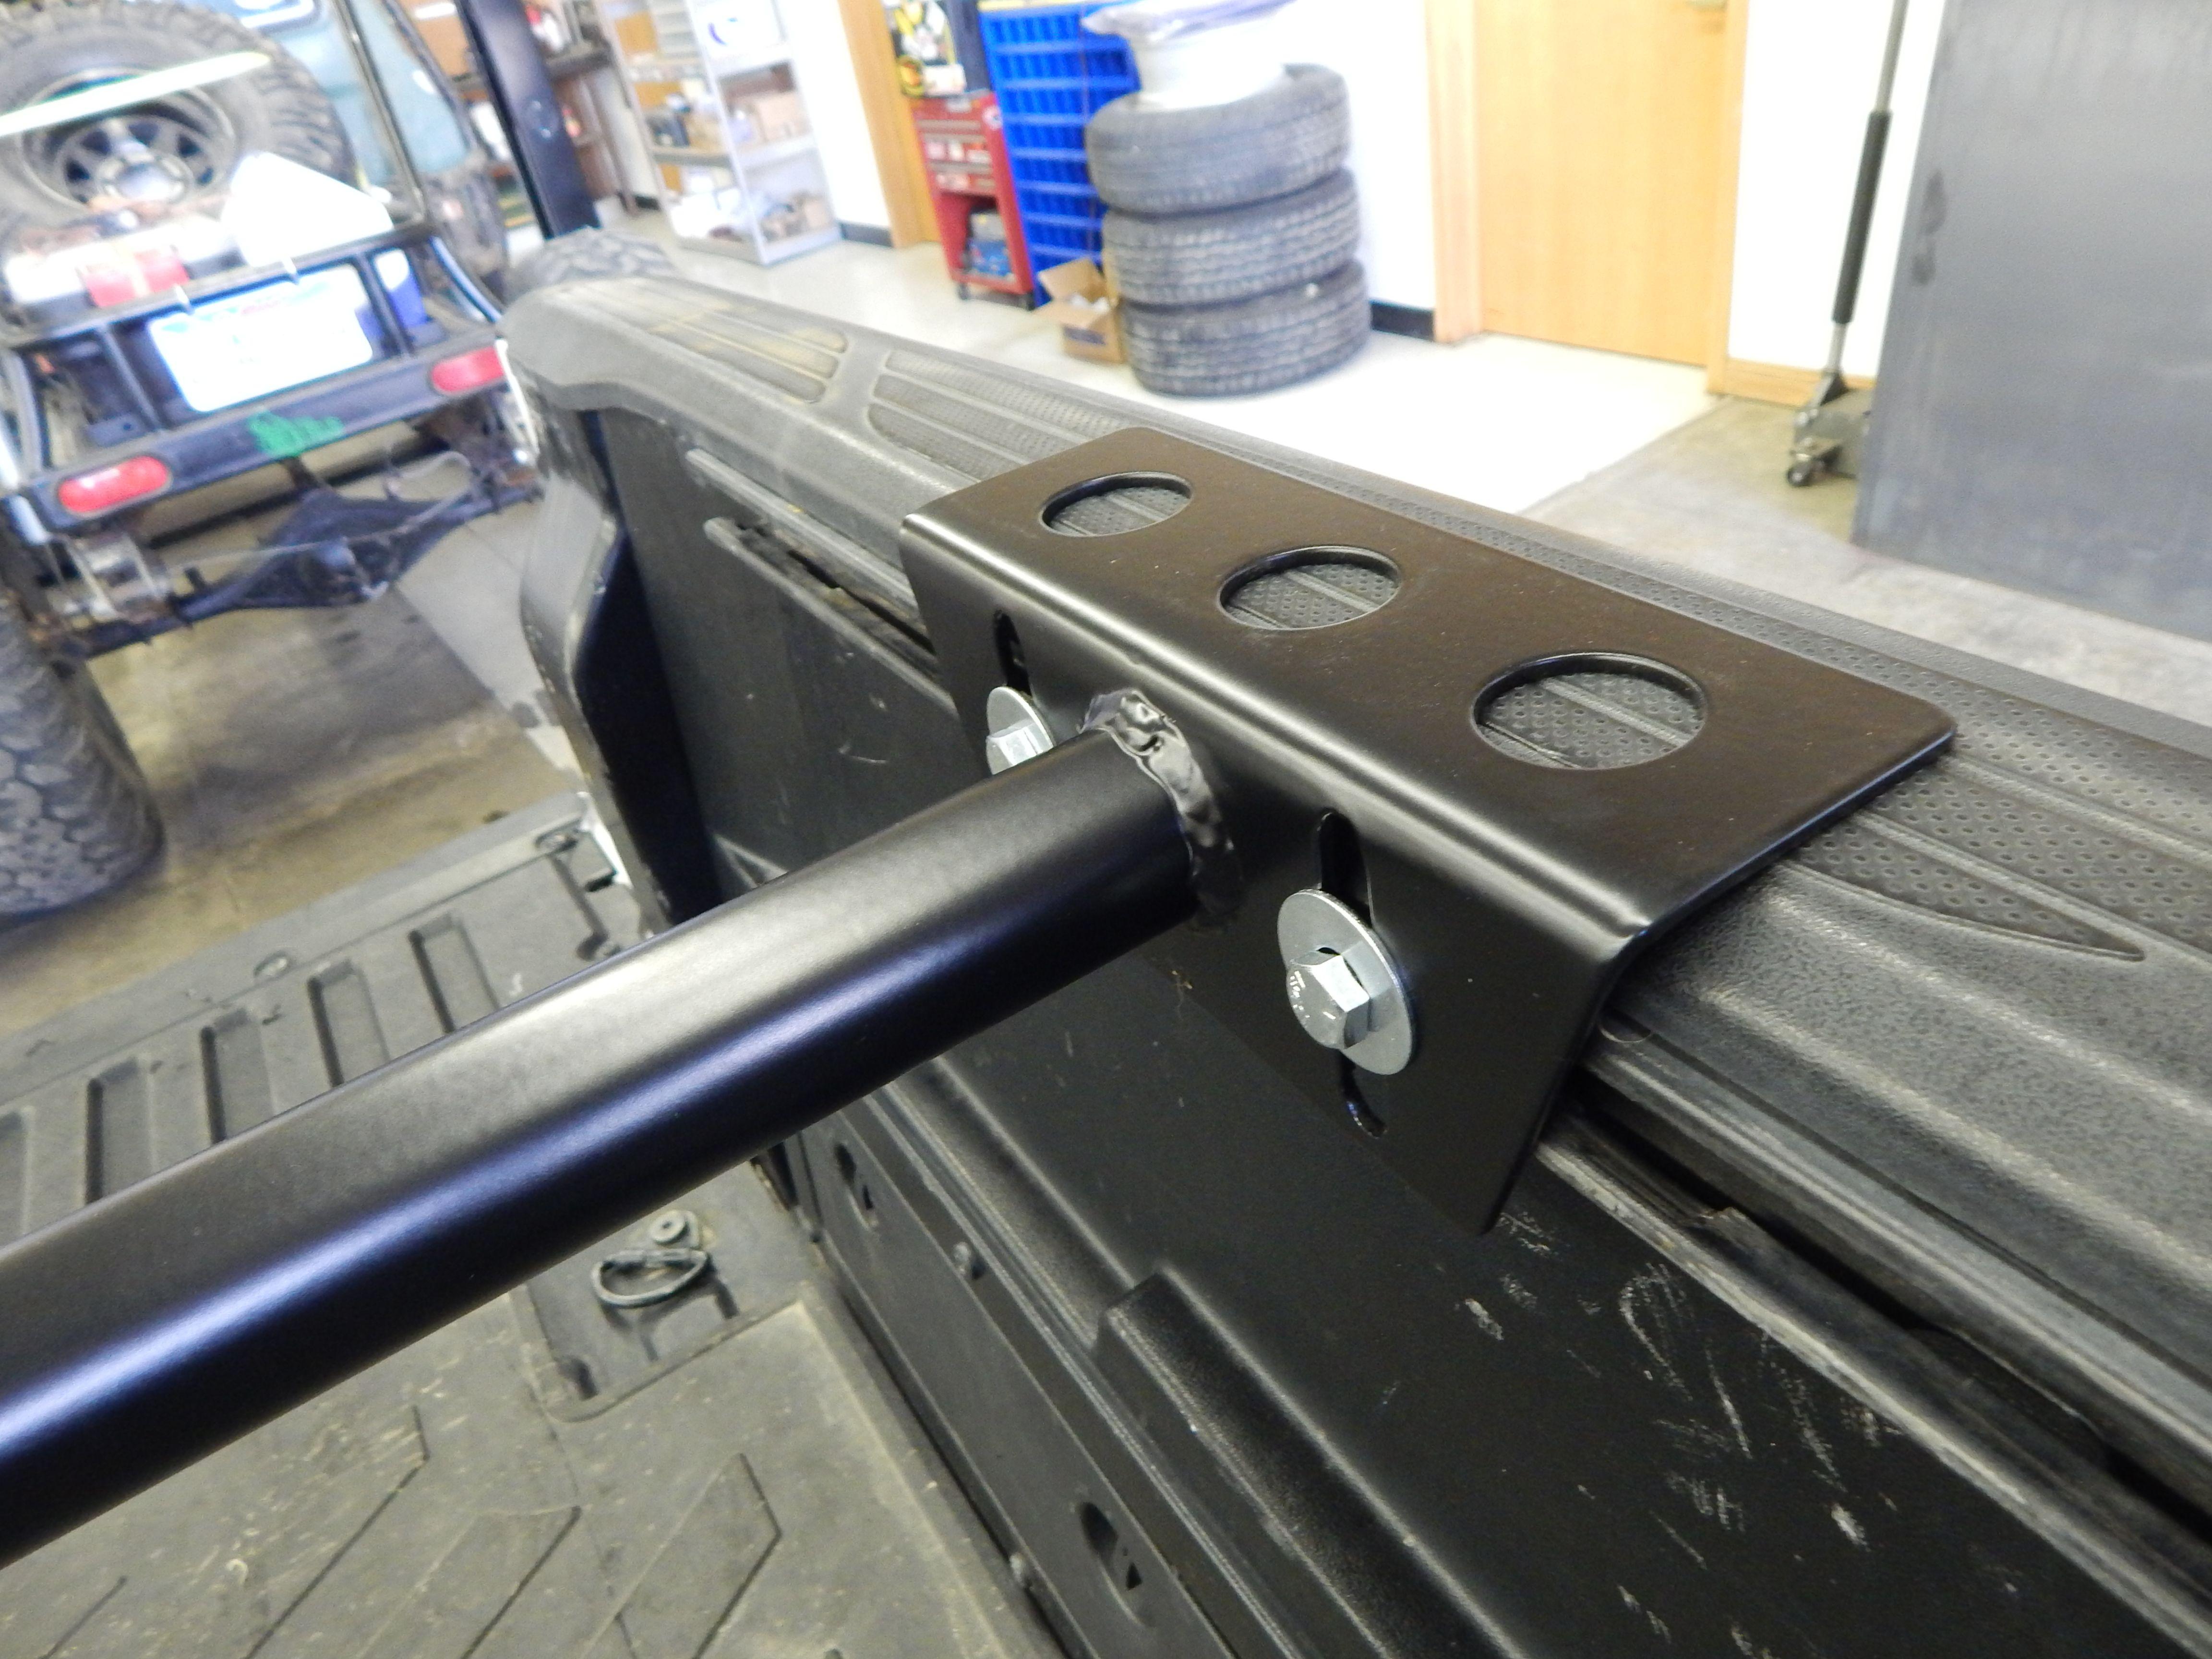 Tacoma Lo Pro Bed Bars C4 Fabrication